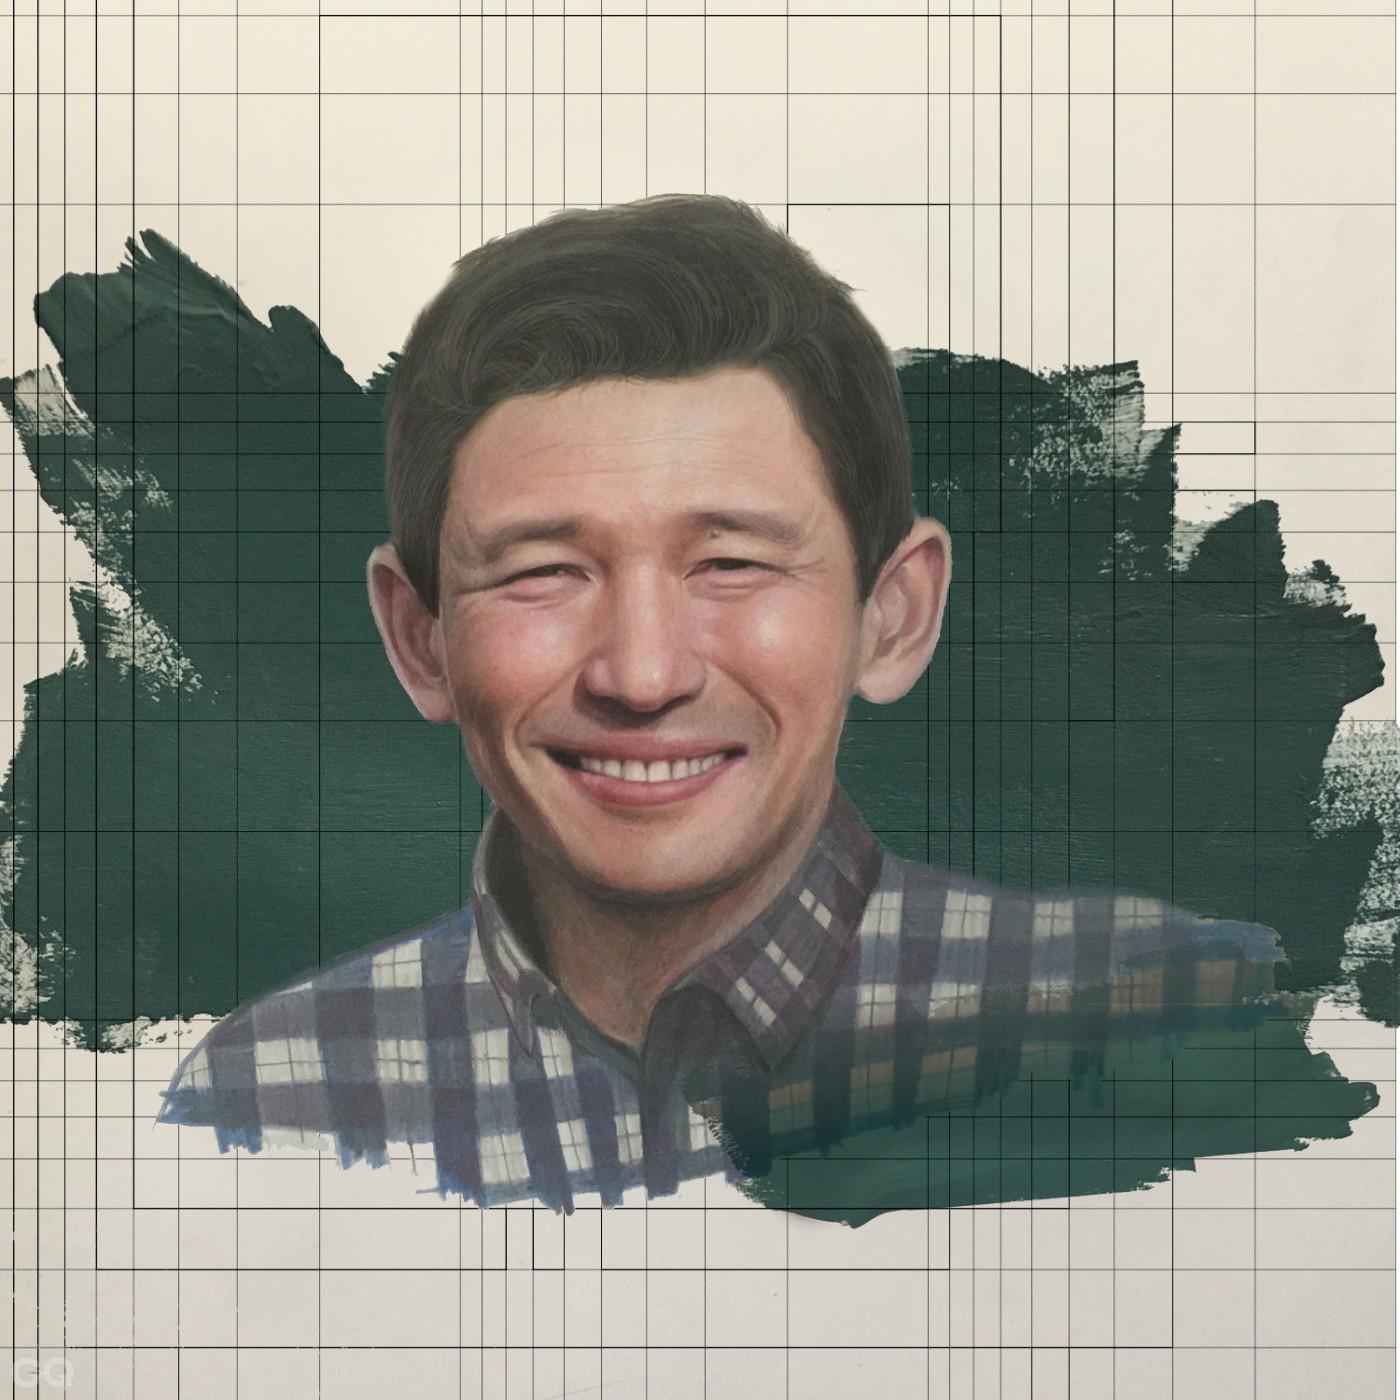 230 GQS_인물론 2-수정-황정민